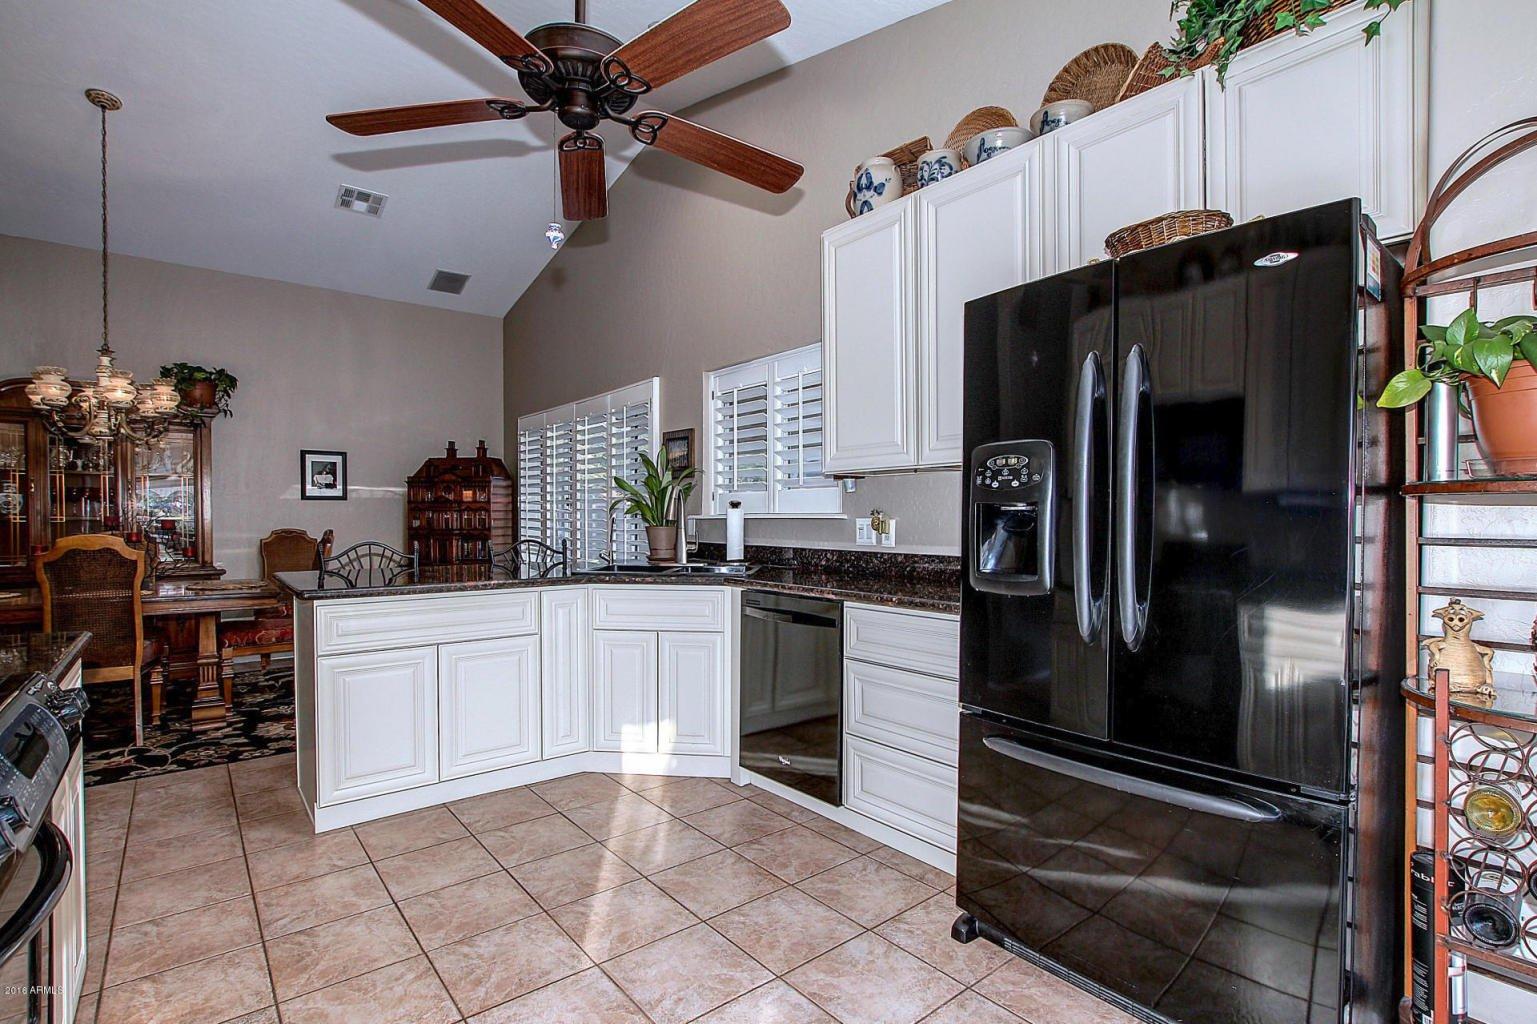 Photo 13: Photos: 3602 E Mountain Sky Avenue in Phoenix: Ahwatukee House for sale : MLS®# 5462780